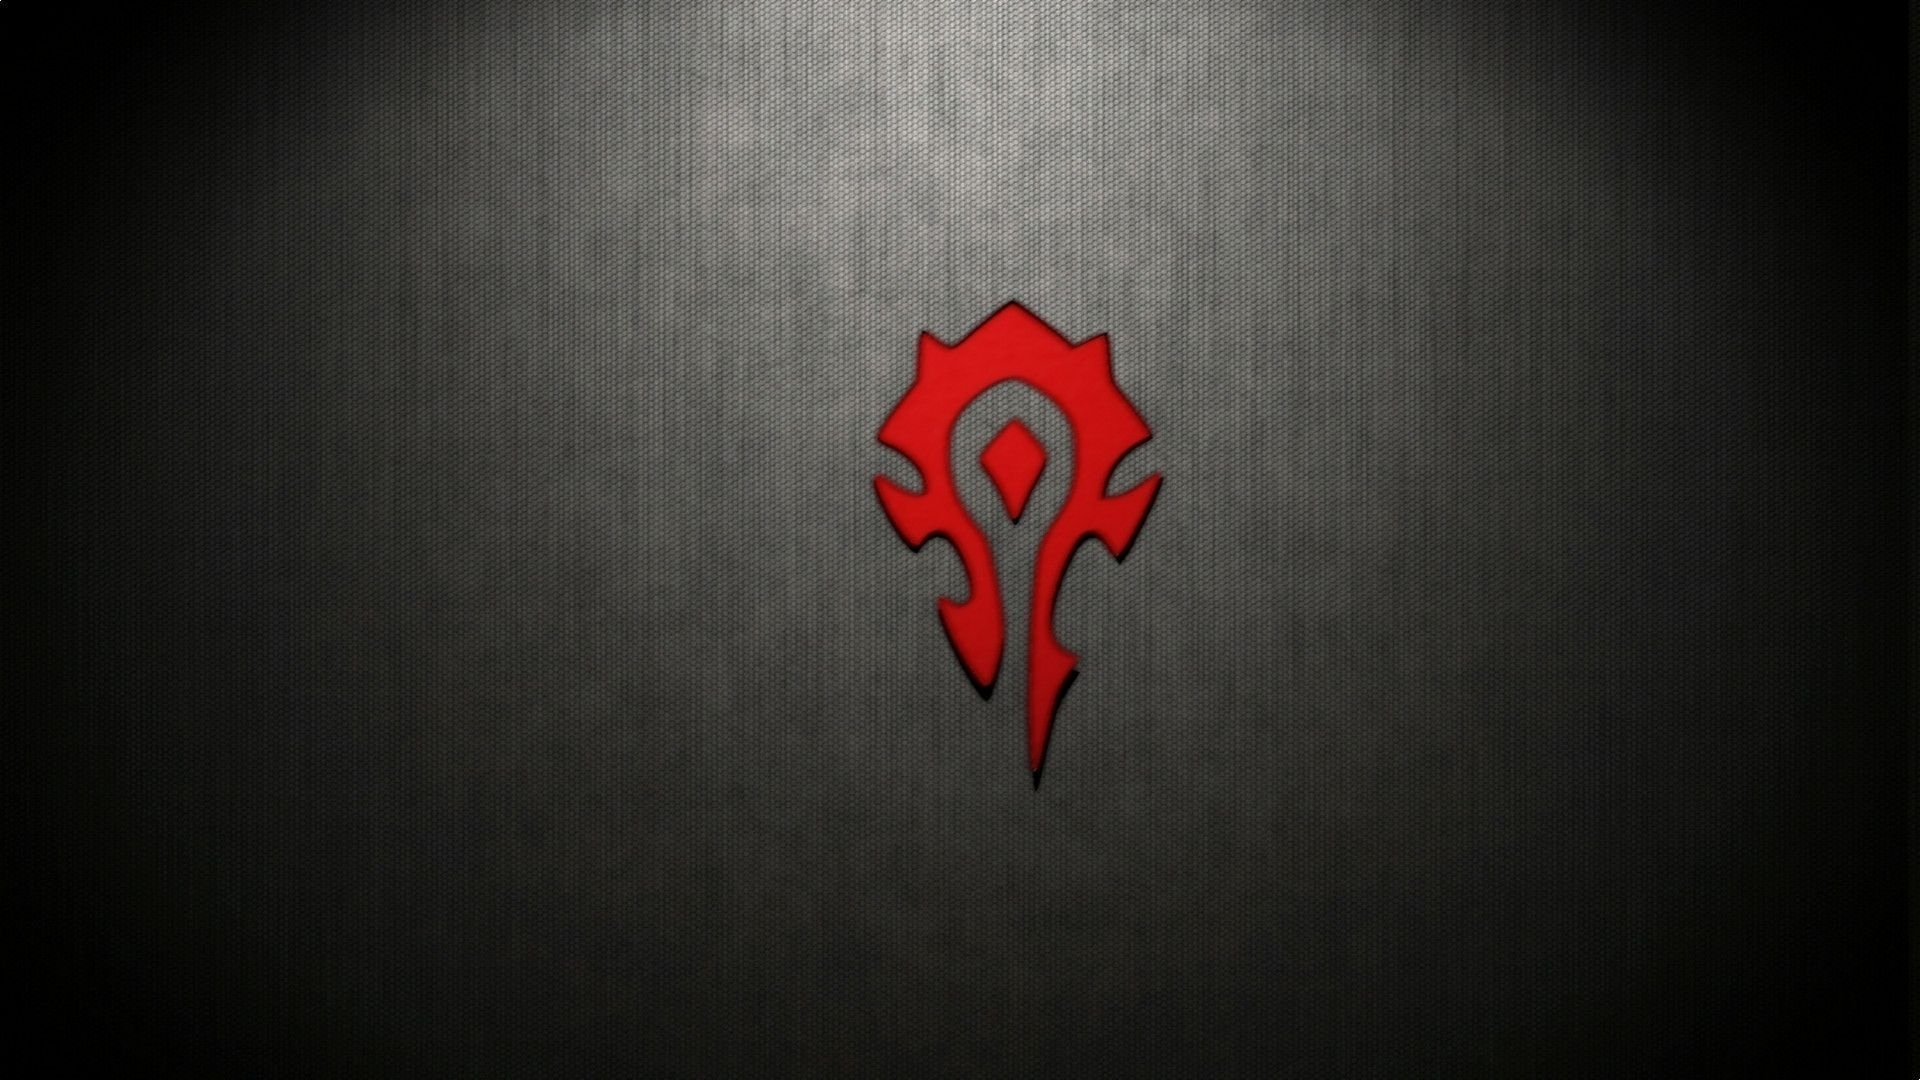 horde logo wallpapers - wallpaper cave   free wallpapers   pinterest